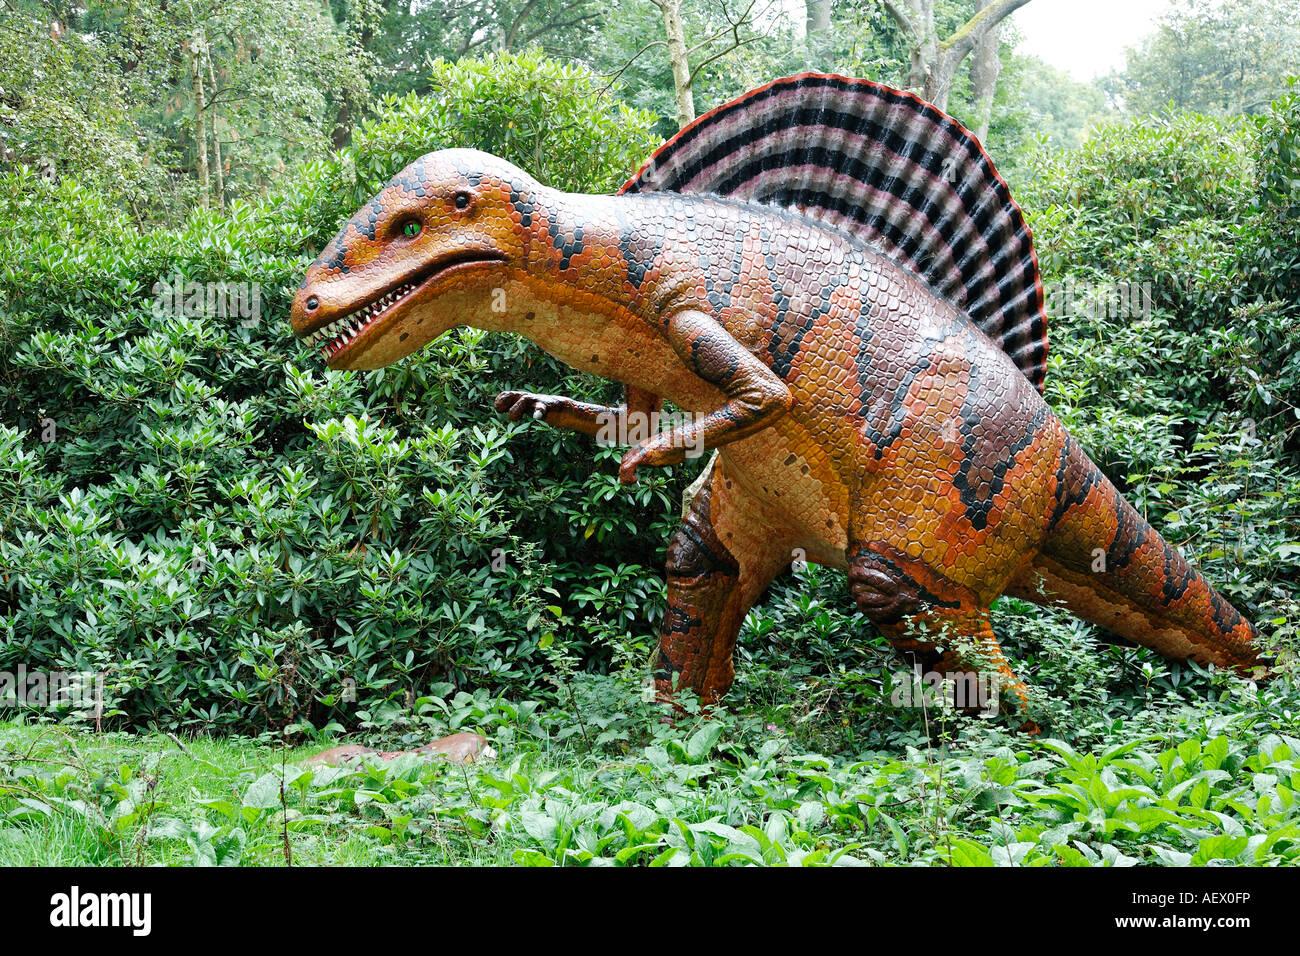 Life size model dinosaur Spinosaurus - Stock Image